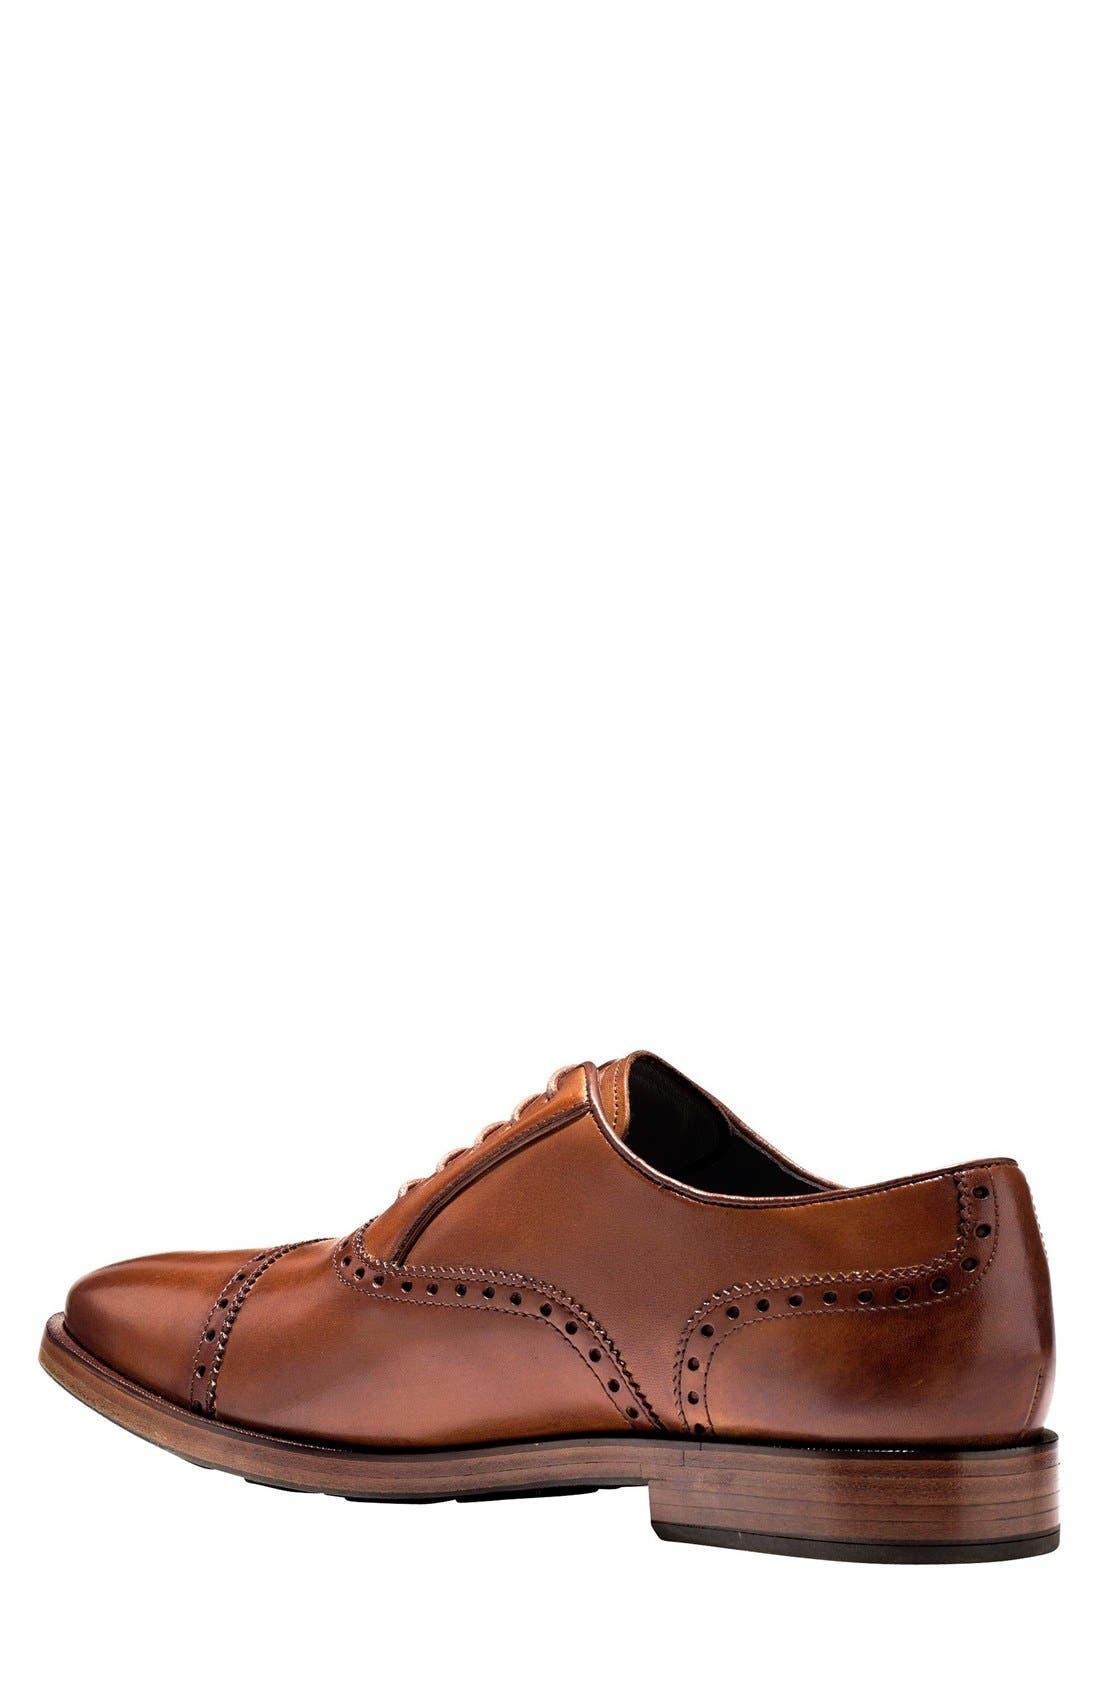 'Hamilton' Cap Toe Oxford,                             Alternate thumbnail 2, color,                             British Tan Leather